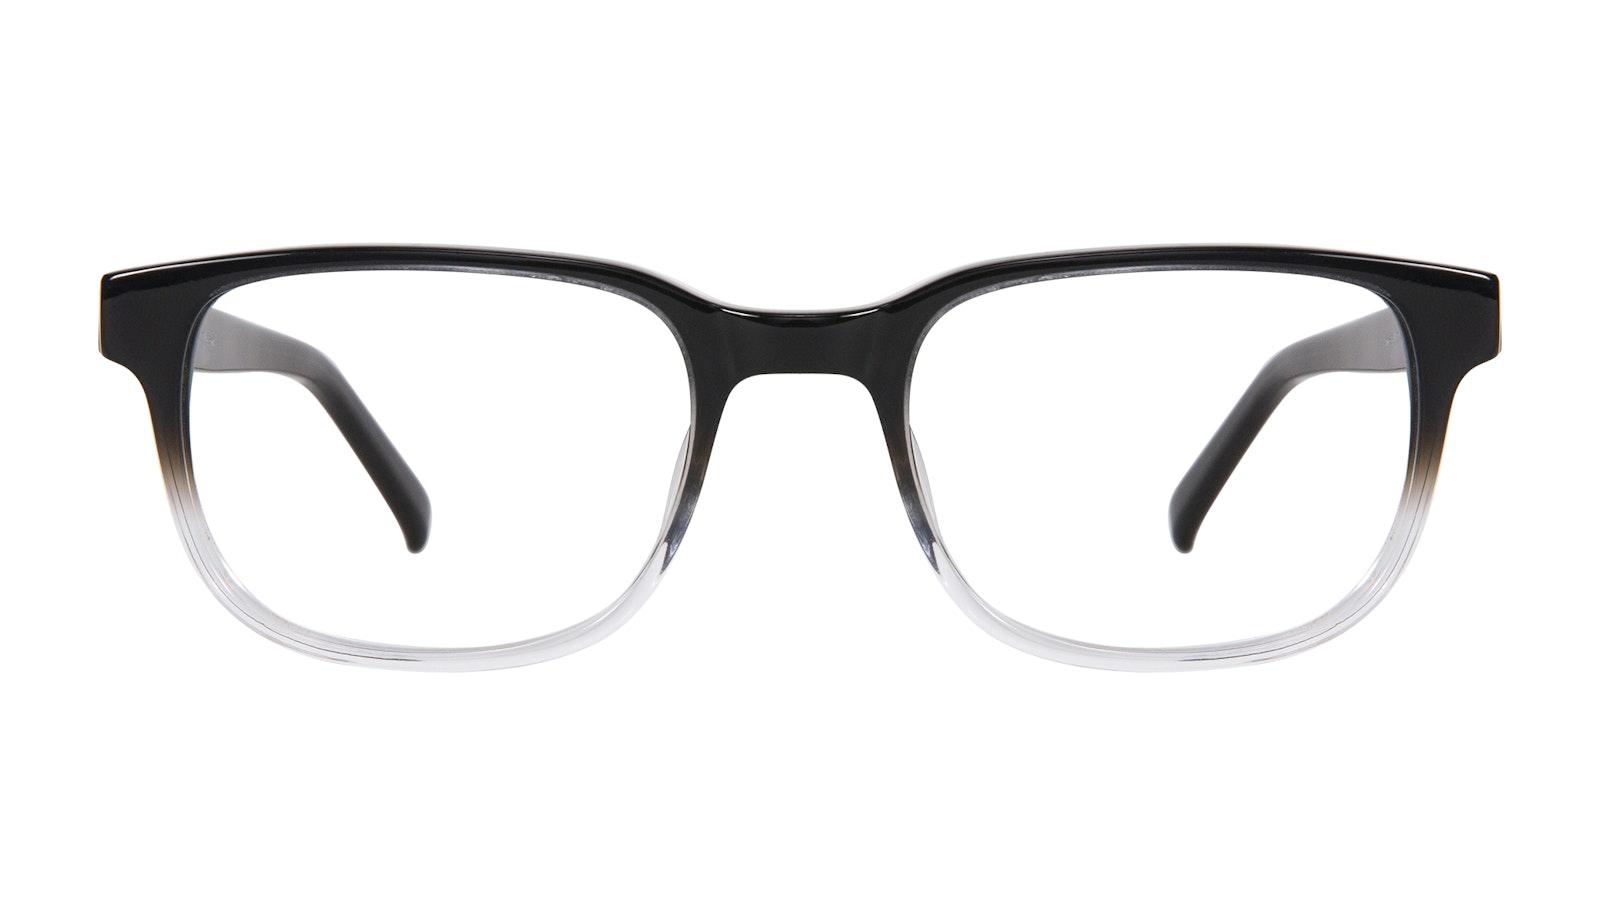 Affordable Fashion Glasses Square Eyeglasses Men Role Onyx Clear